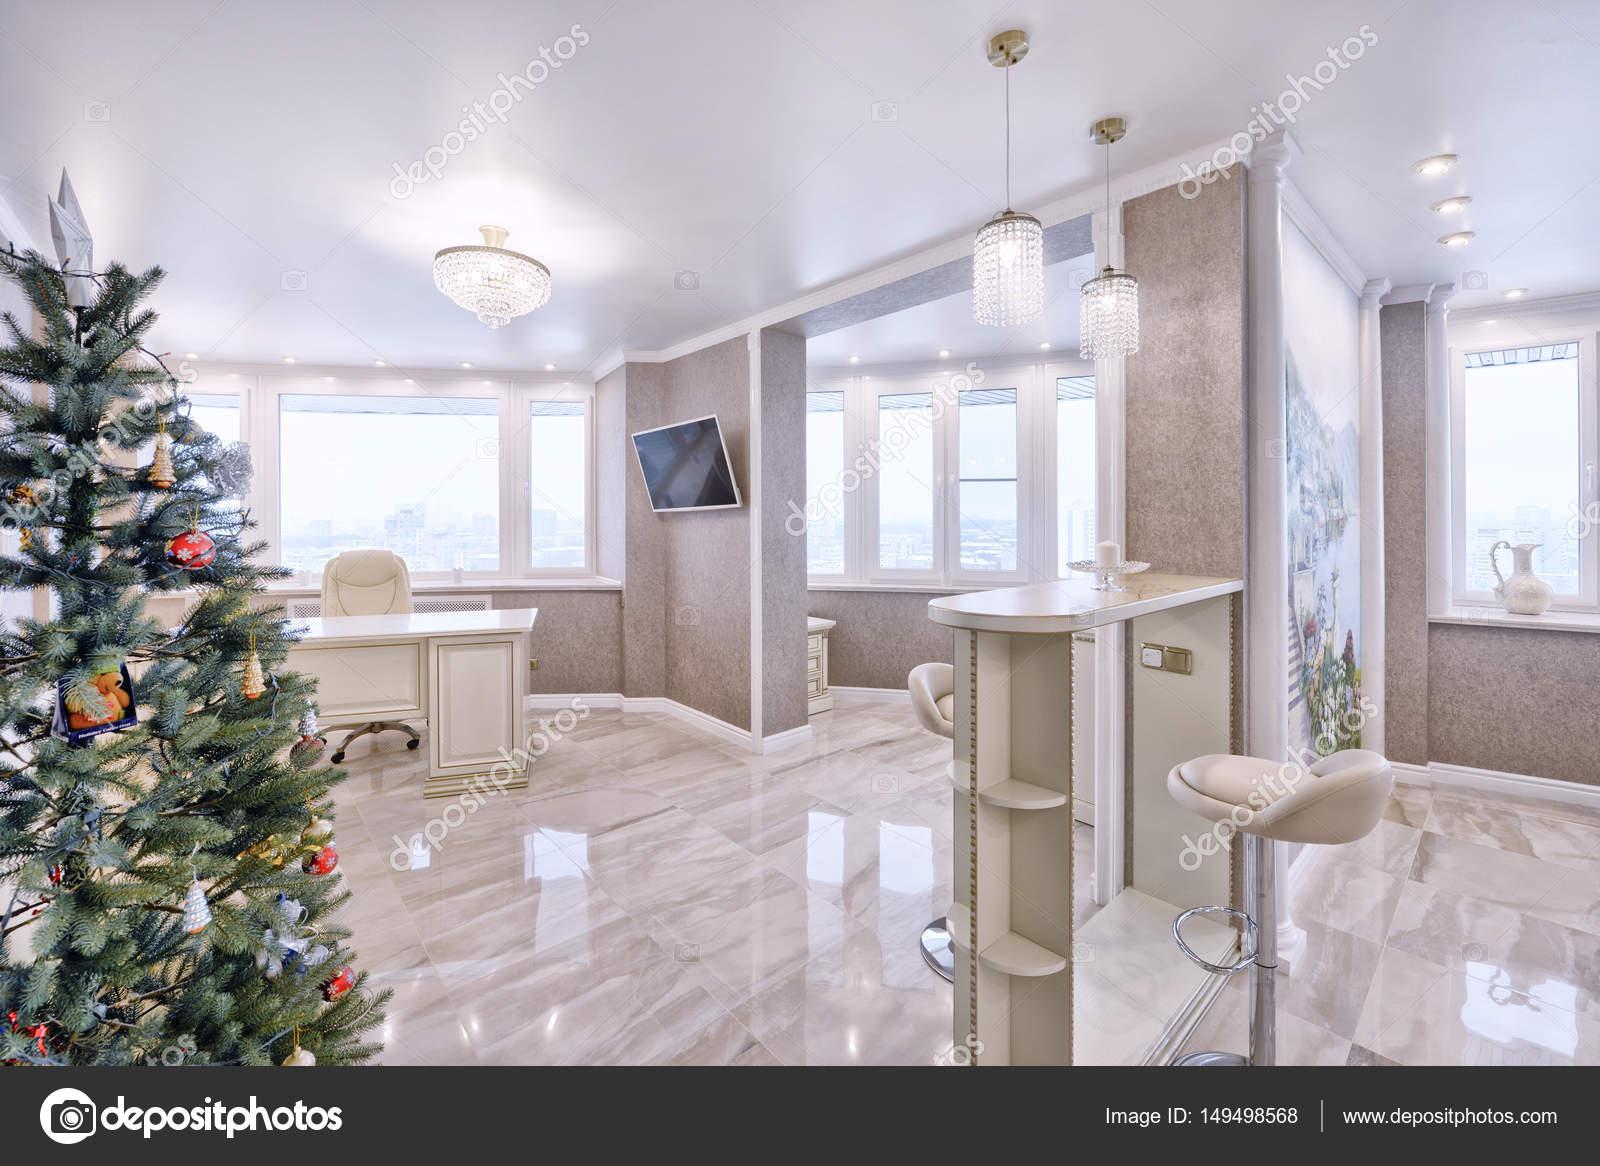 Woonkamer Felle Kleuren : Luxe woonkamer interieur u2014 stockfoto © ovchinnikovfoto #149498568